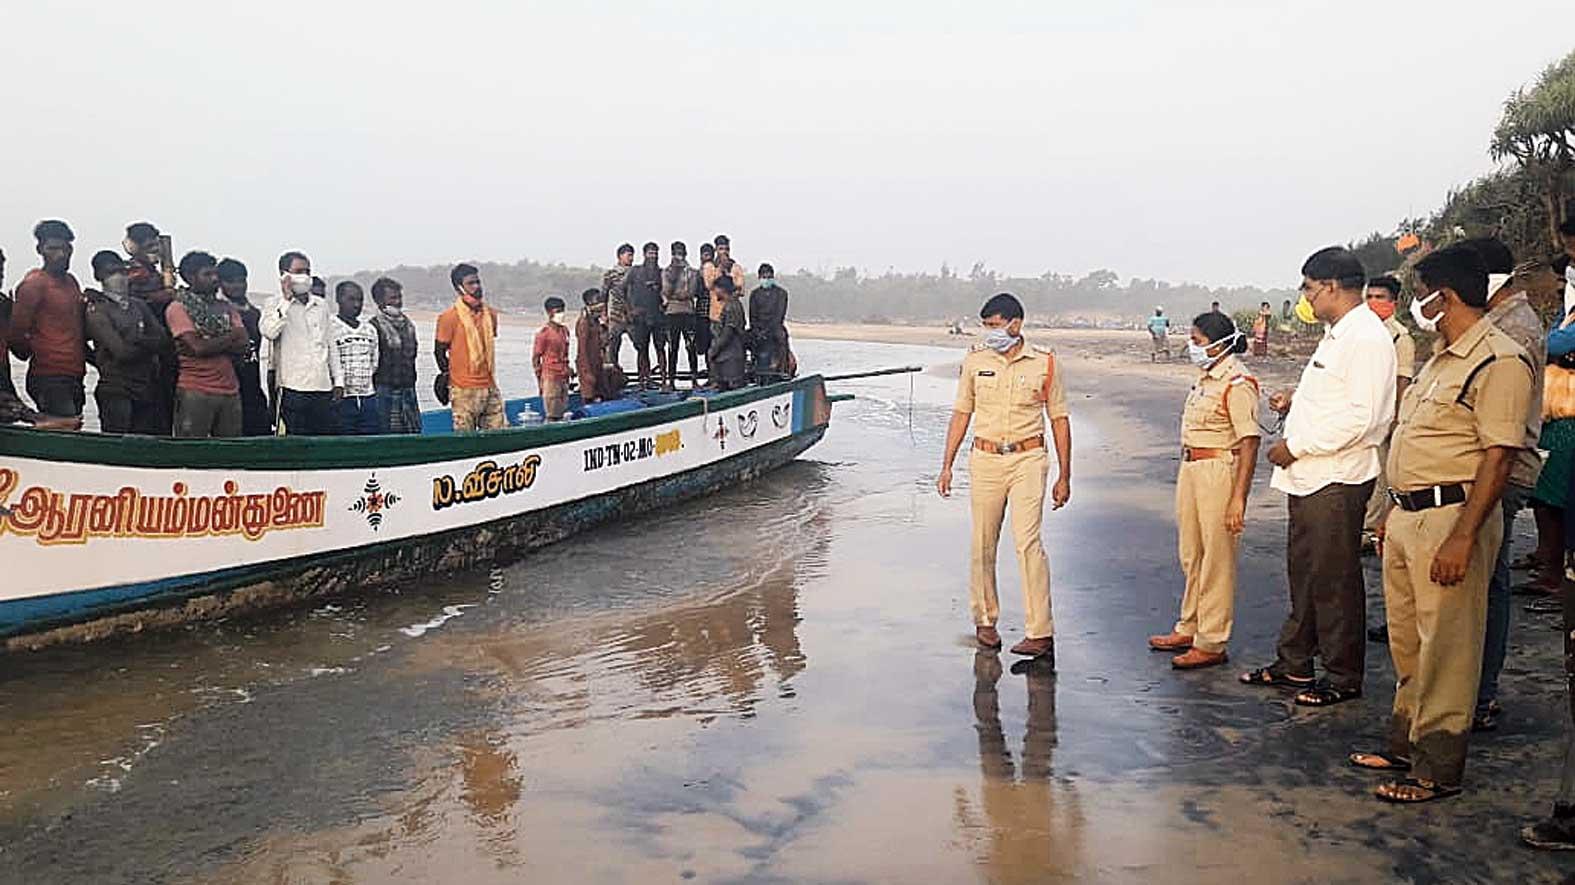 Police take the migrants to the quarantine centre after they reach the Dankuru beach near Ichhapuram in Andhra Pradesh on Monday morning.